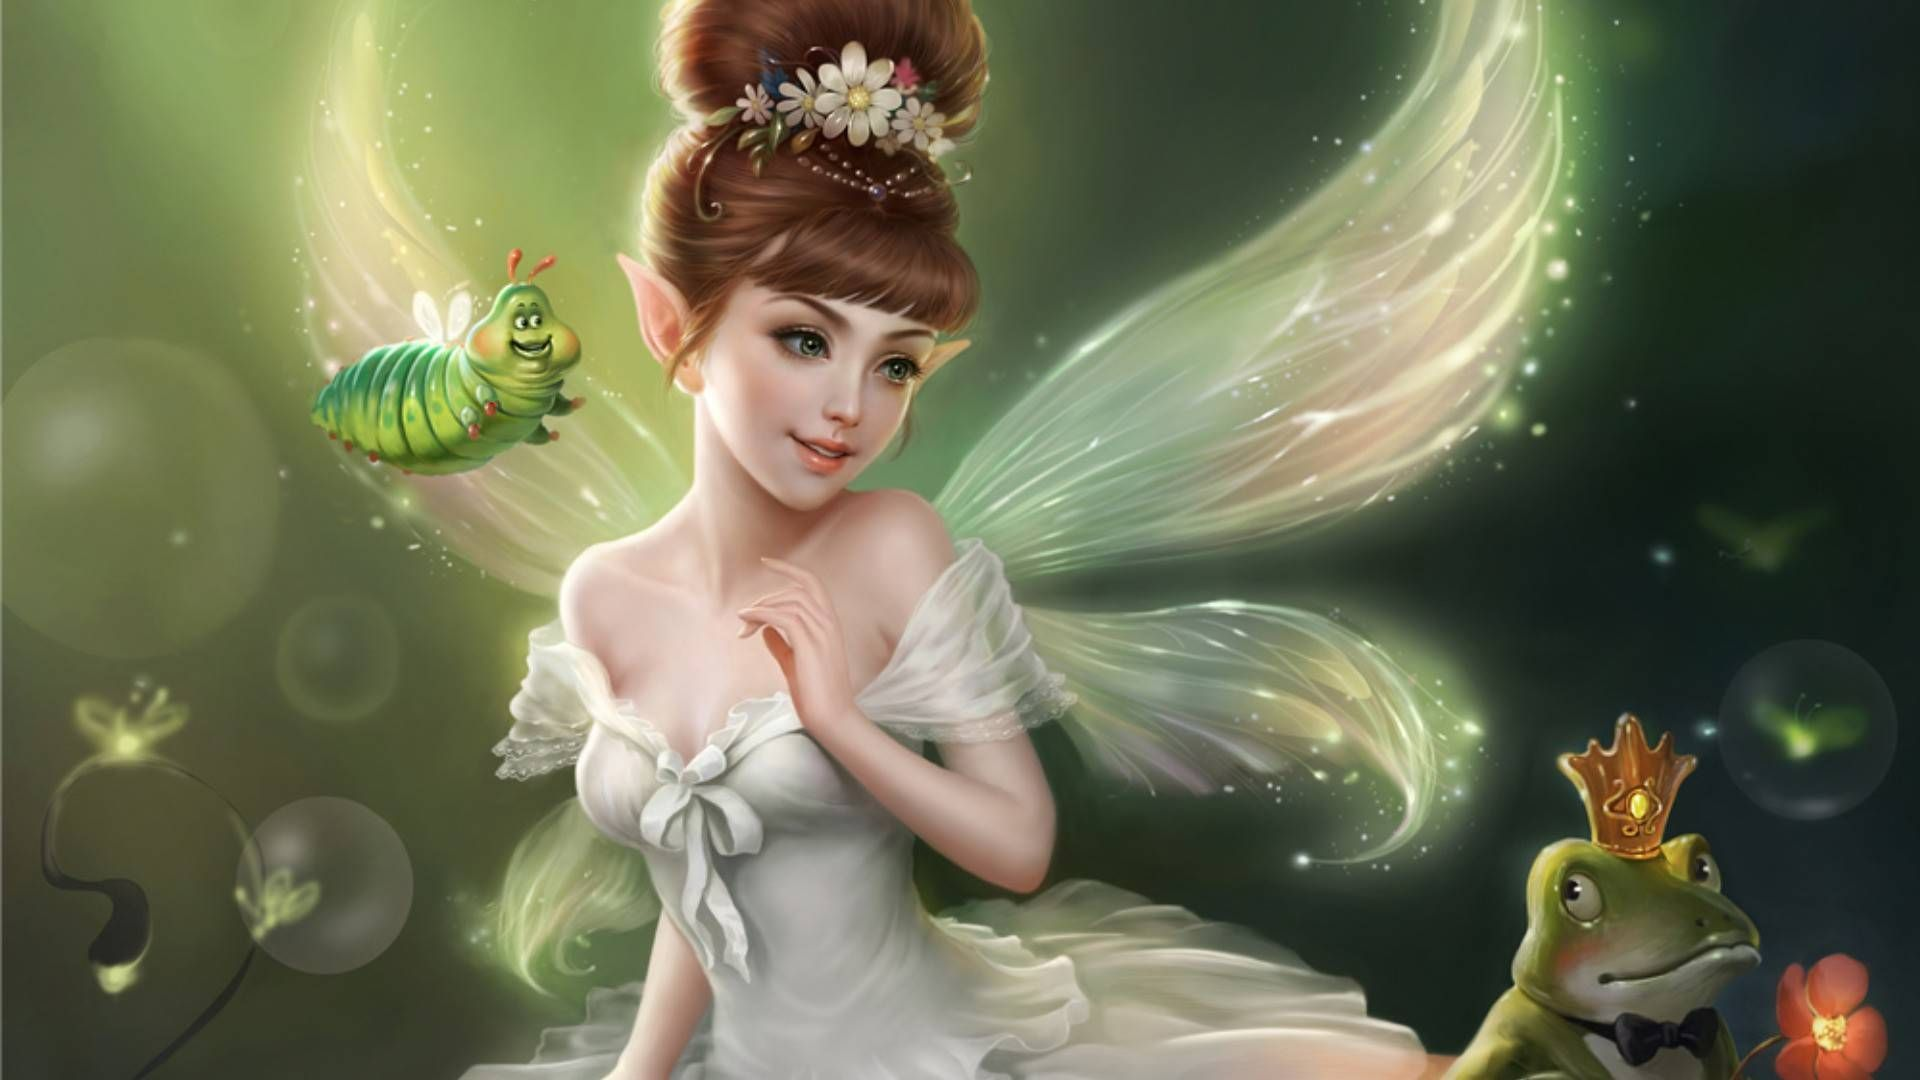 Beautiful Fairy Wallpaper Hd 10 Cool Wallpaper